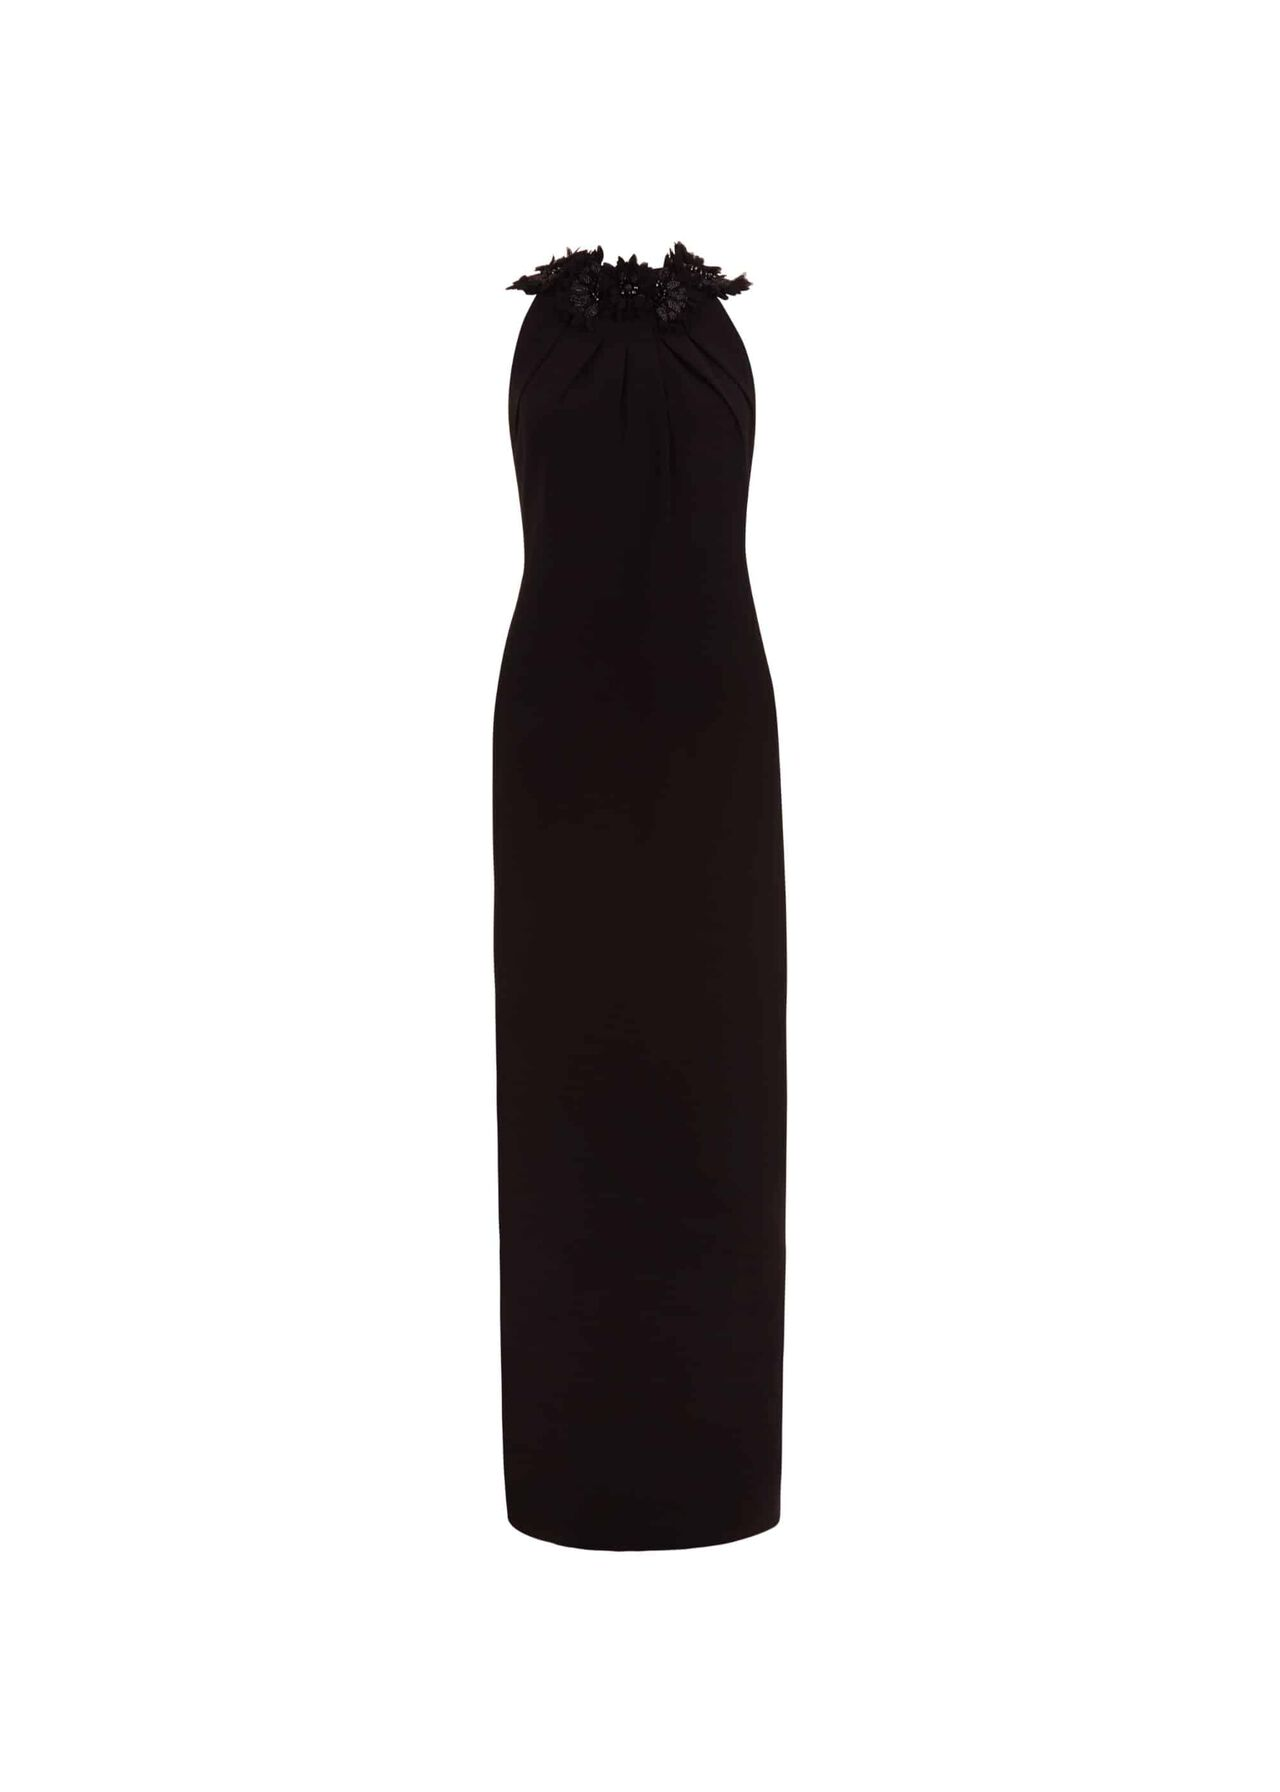 Emerson Maxi Dress Black